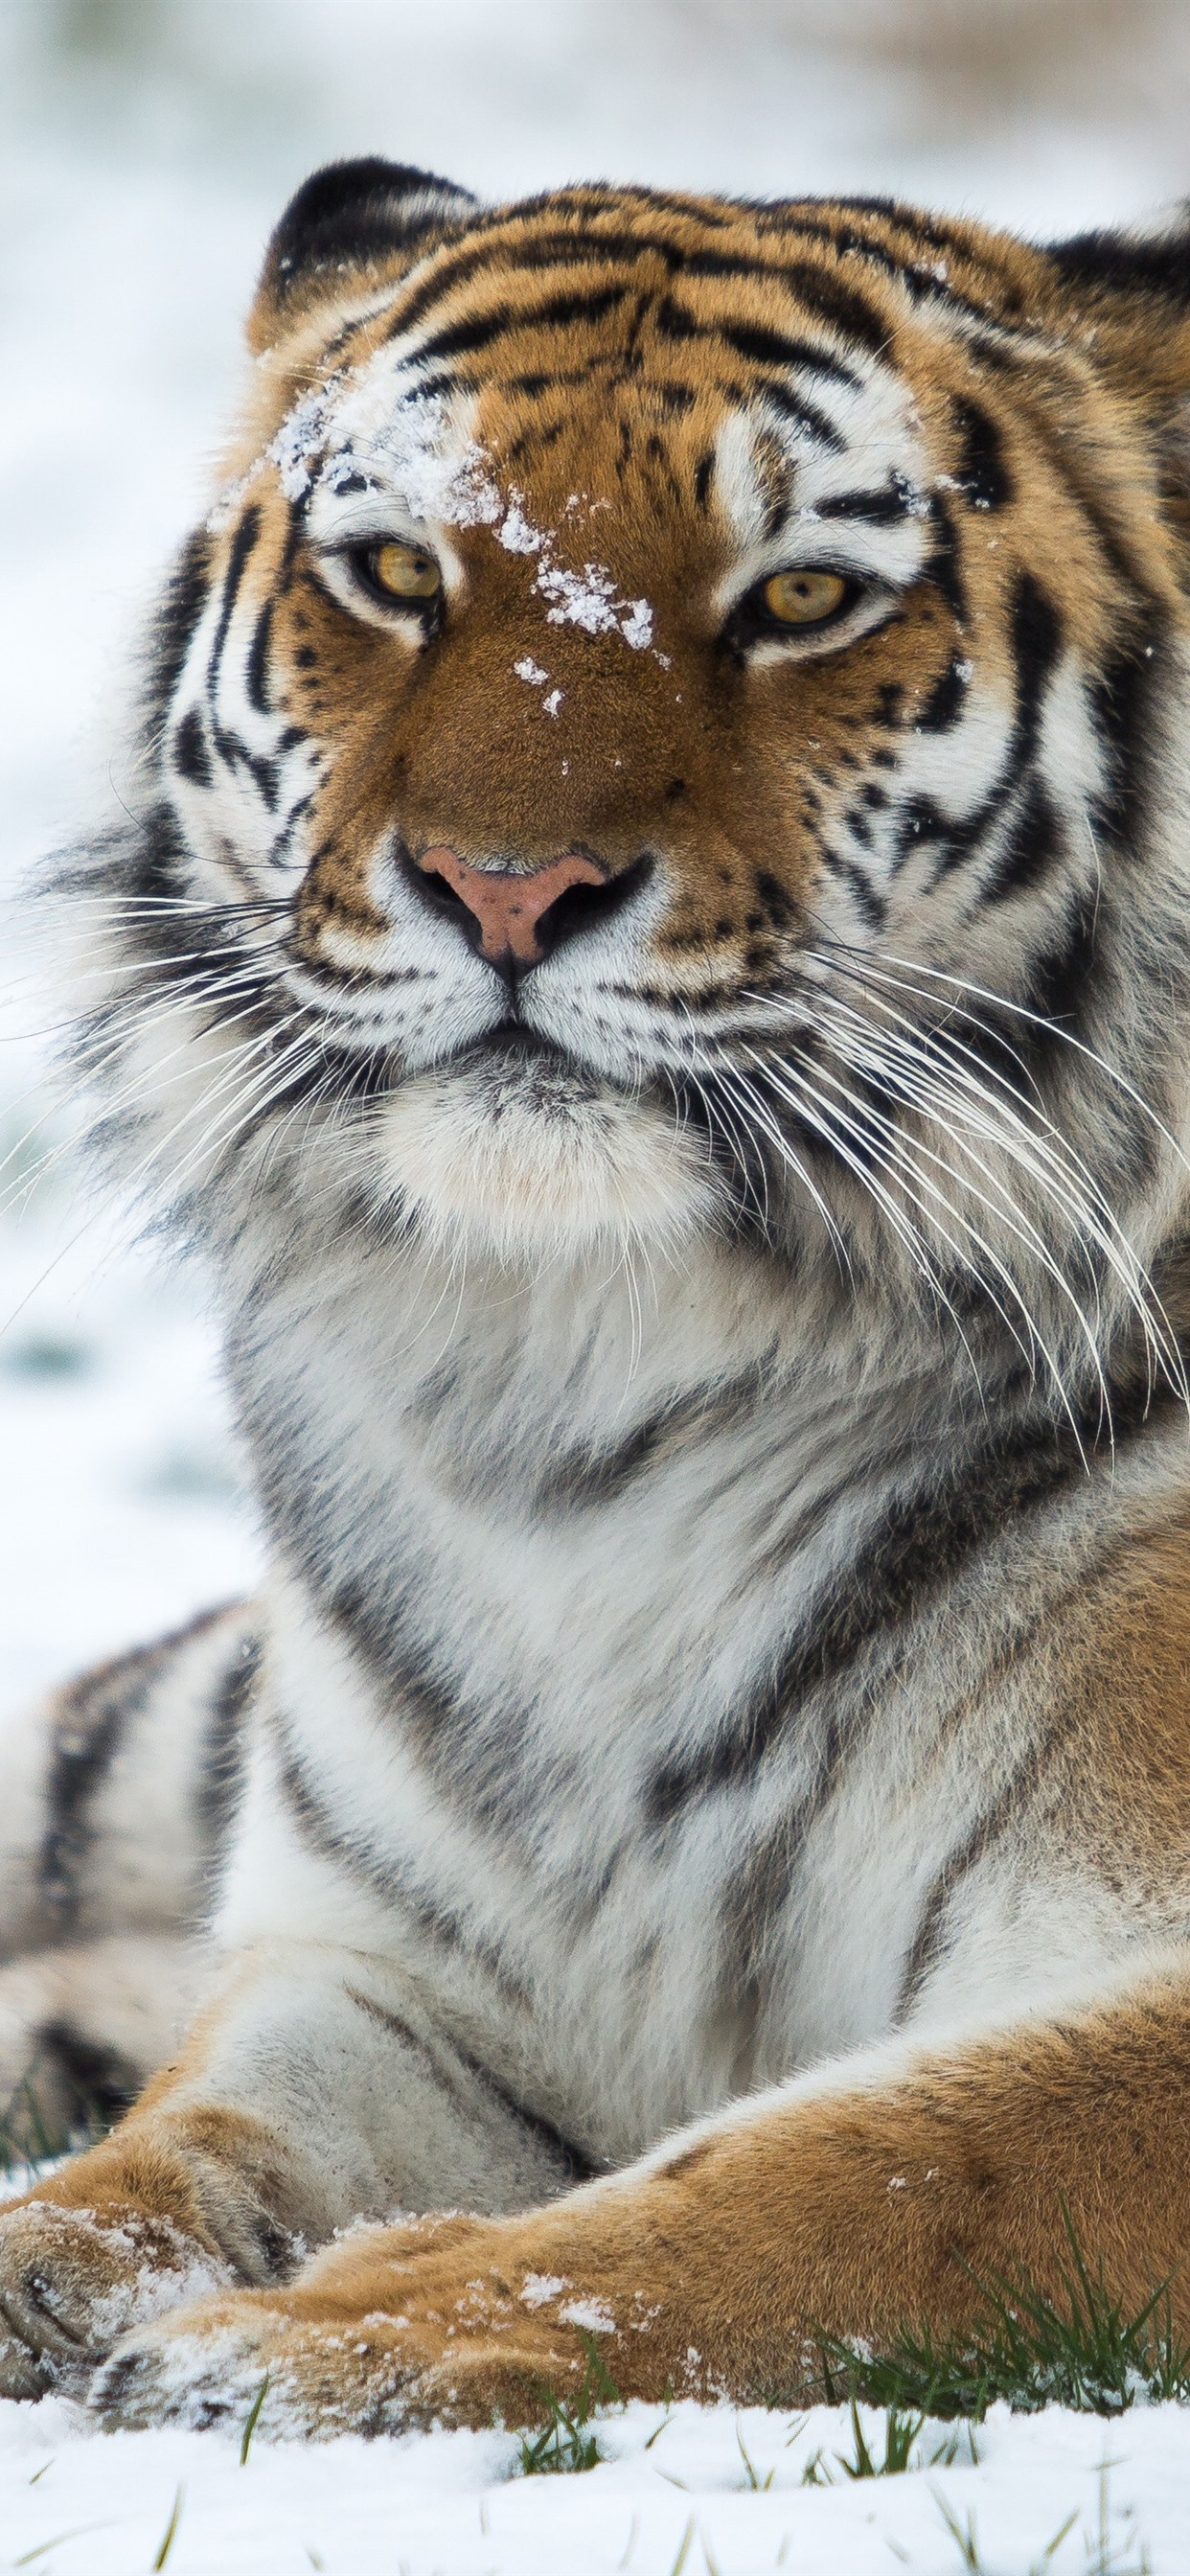 Tiger Wildlife Snow Winter 1242x2688 Iphone Xs Max